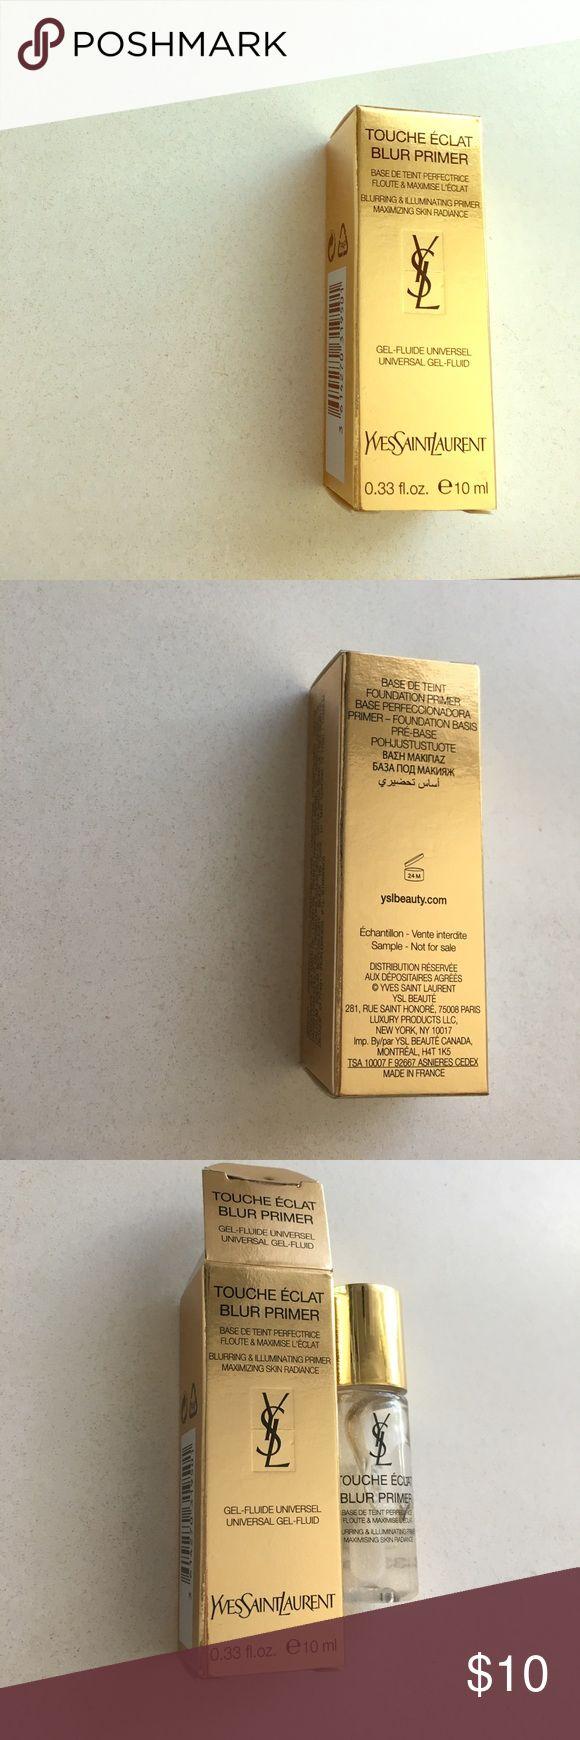 YSL Touche Eclat Blur Primer YSL Touche Eclat Blur Primer, unopened 10ml deluxe sample size Yves Saint Laurent Makeup Face Primer